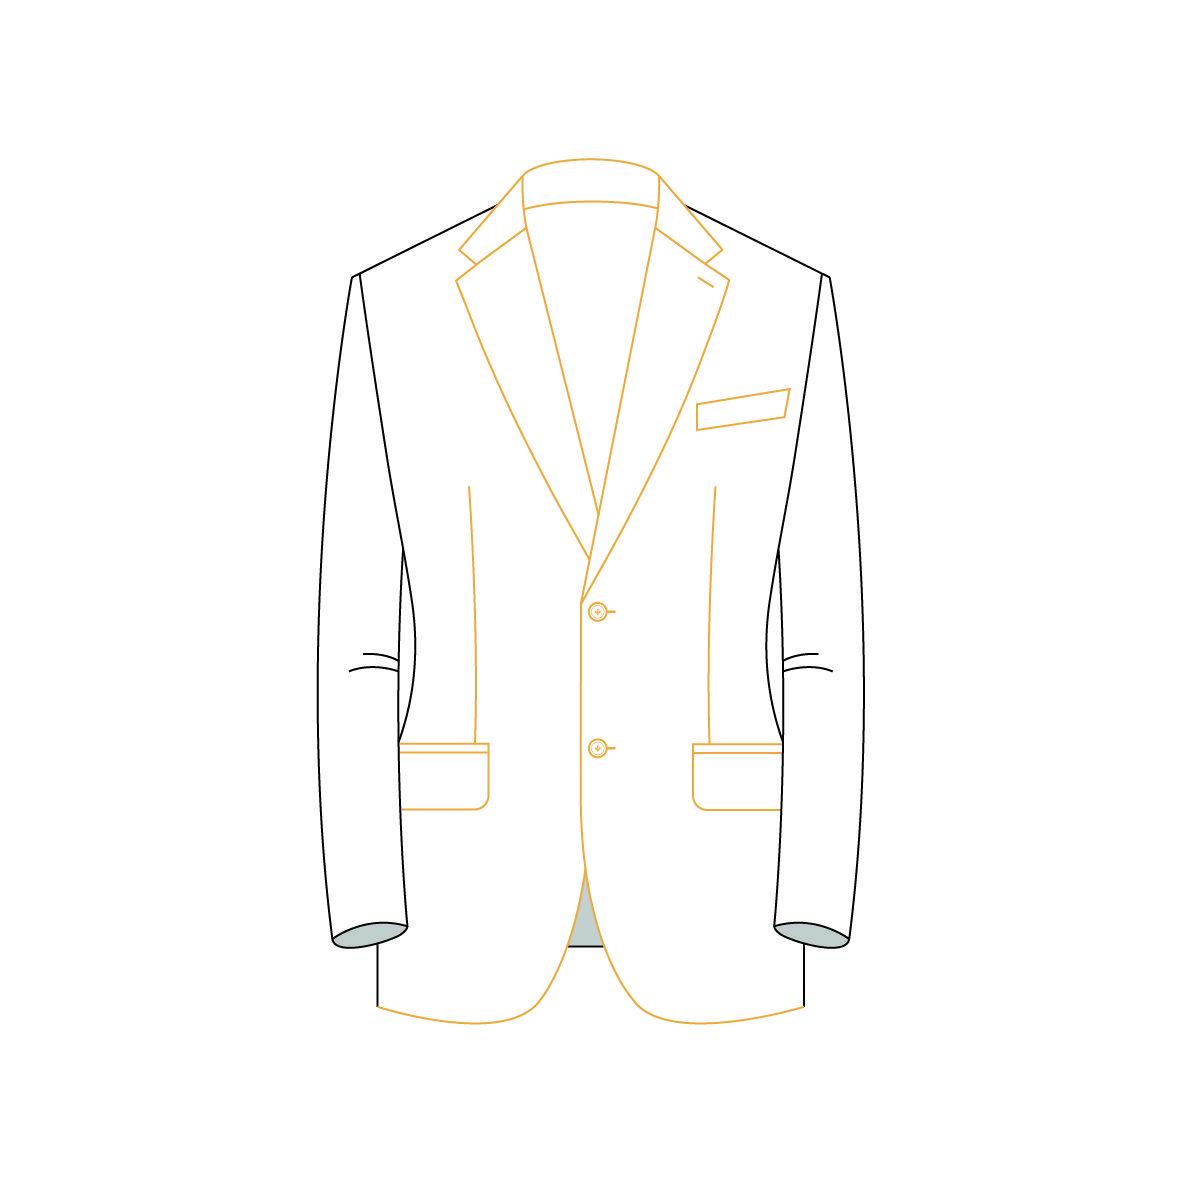 Senszio Garment Finals V2 Jacket Style 11